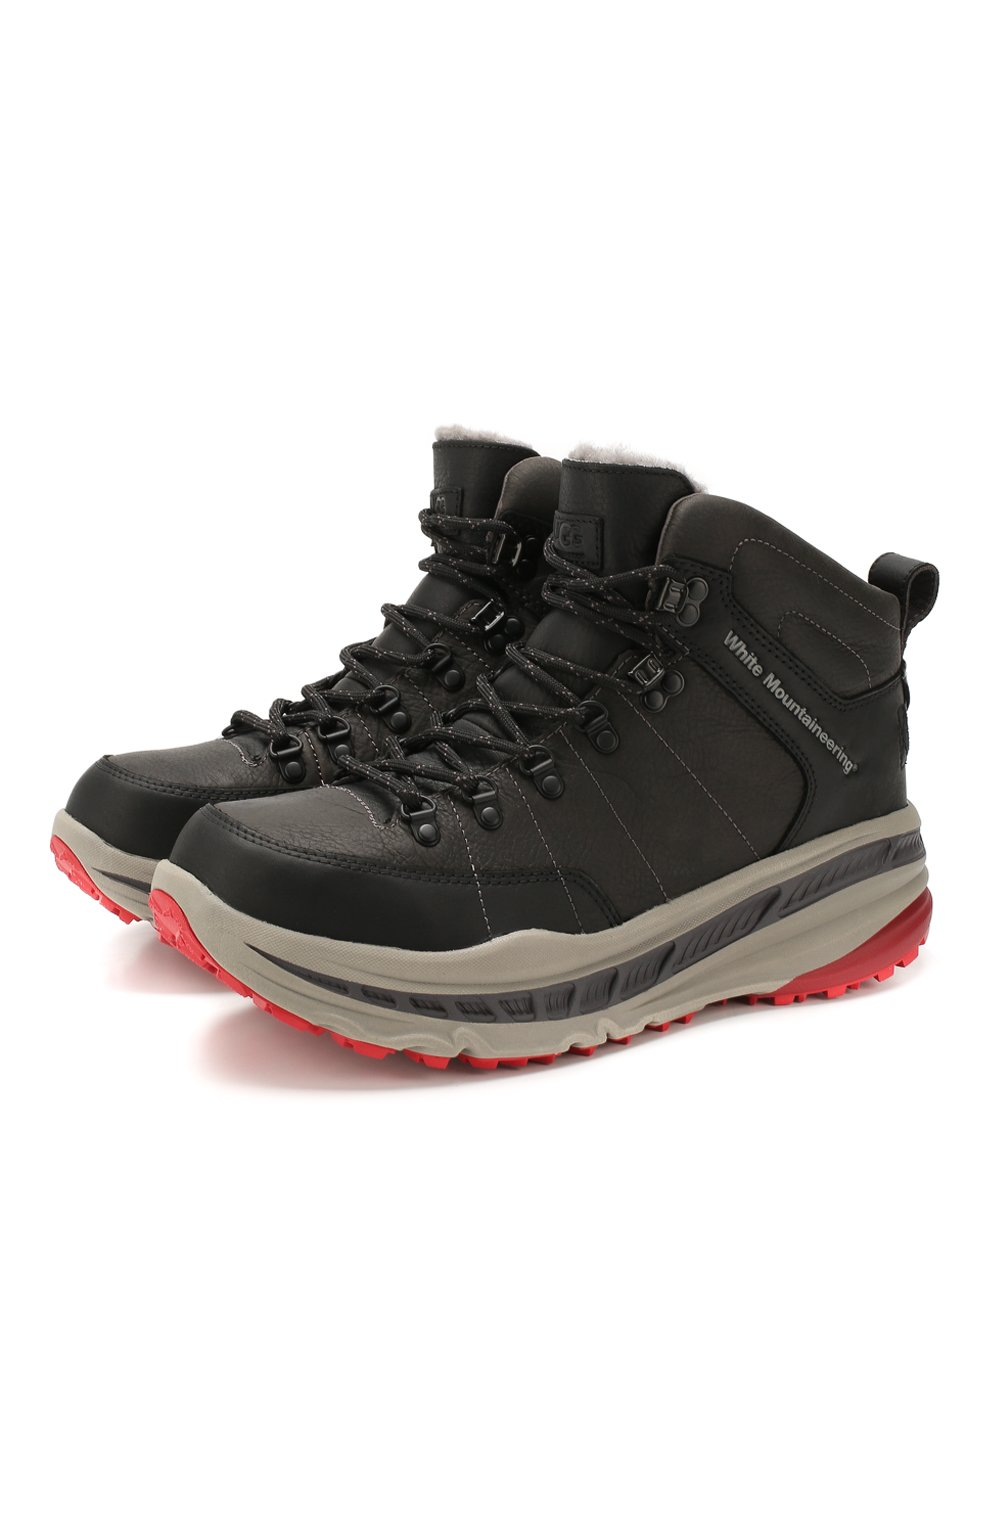 Мужские кожаные ботинки ugg x white mountaineering 805 hiker UGG черного цвета, арт. 1108650_BLK   Фото 1